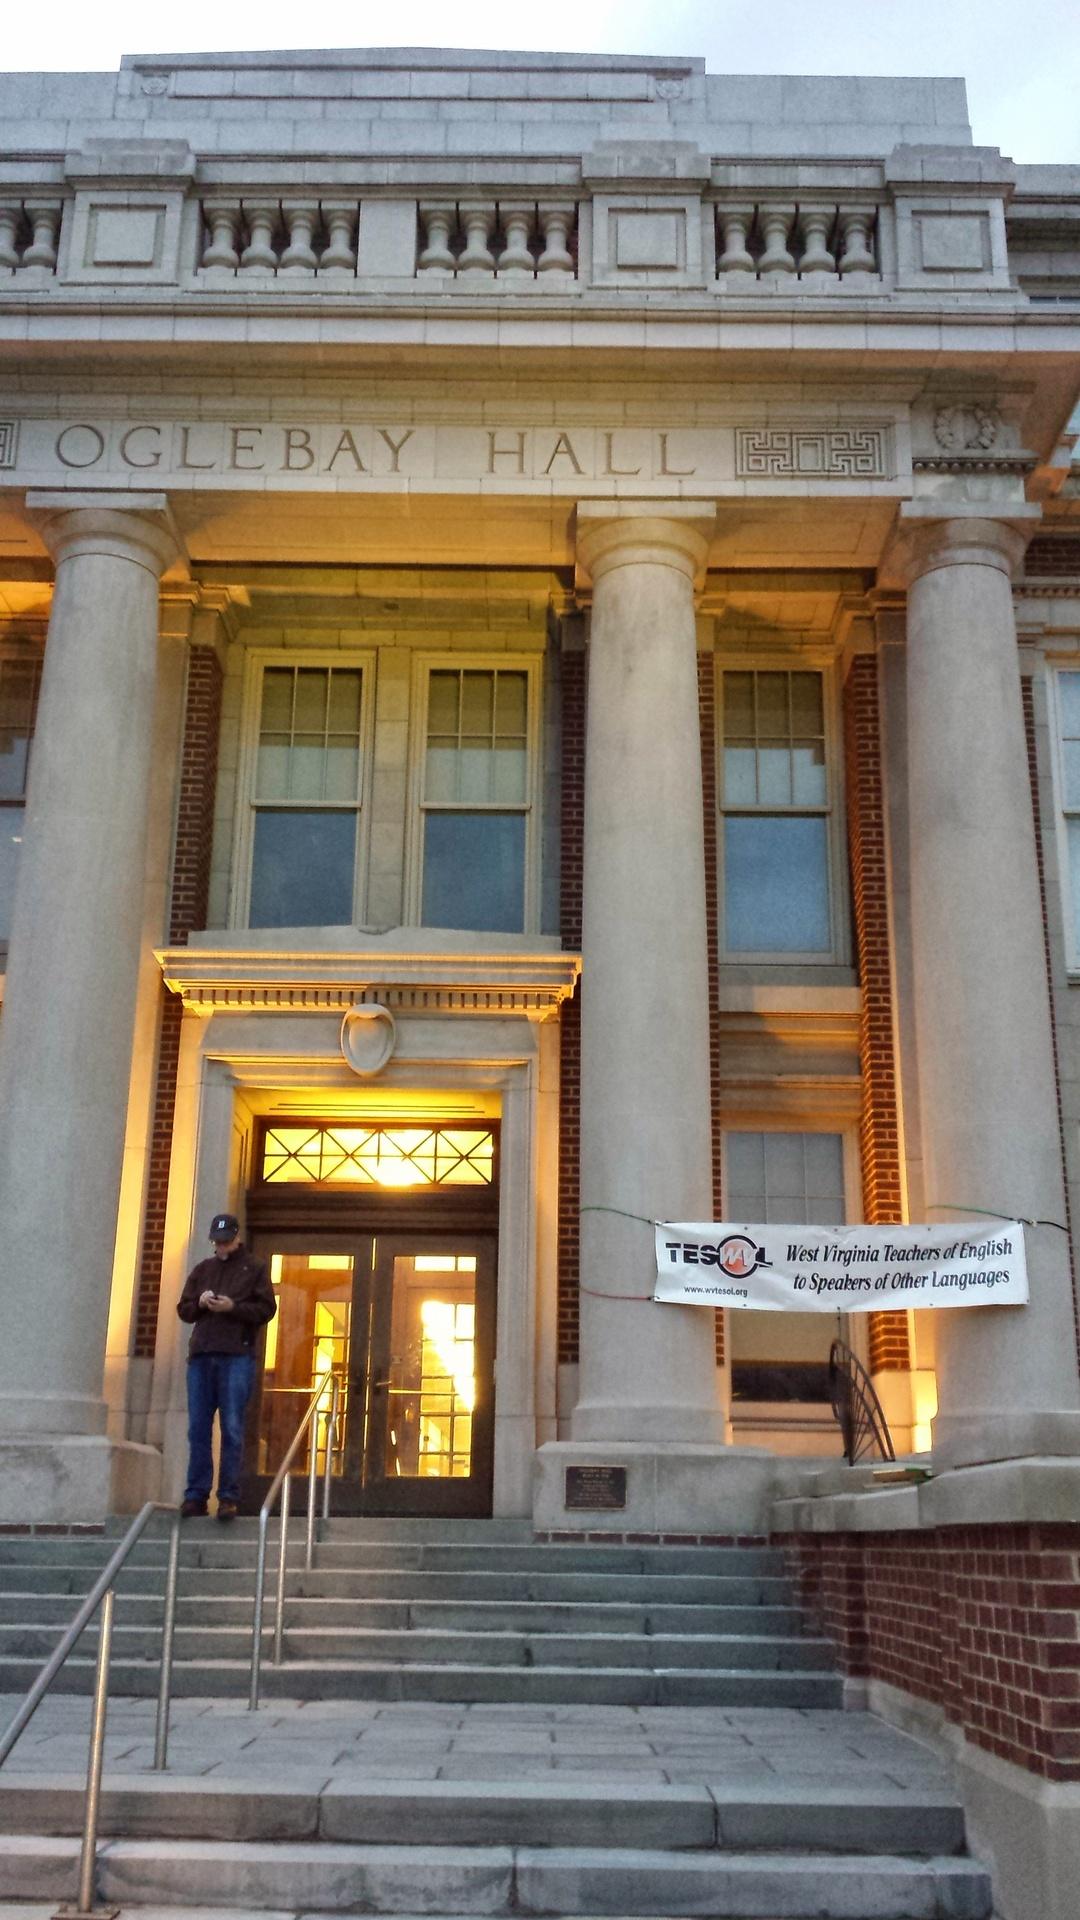 Oglebay Hall